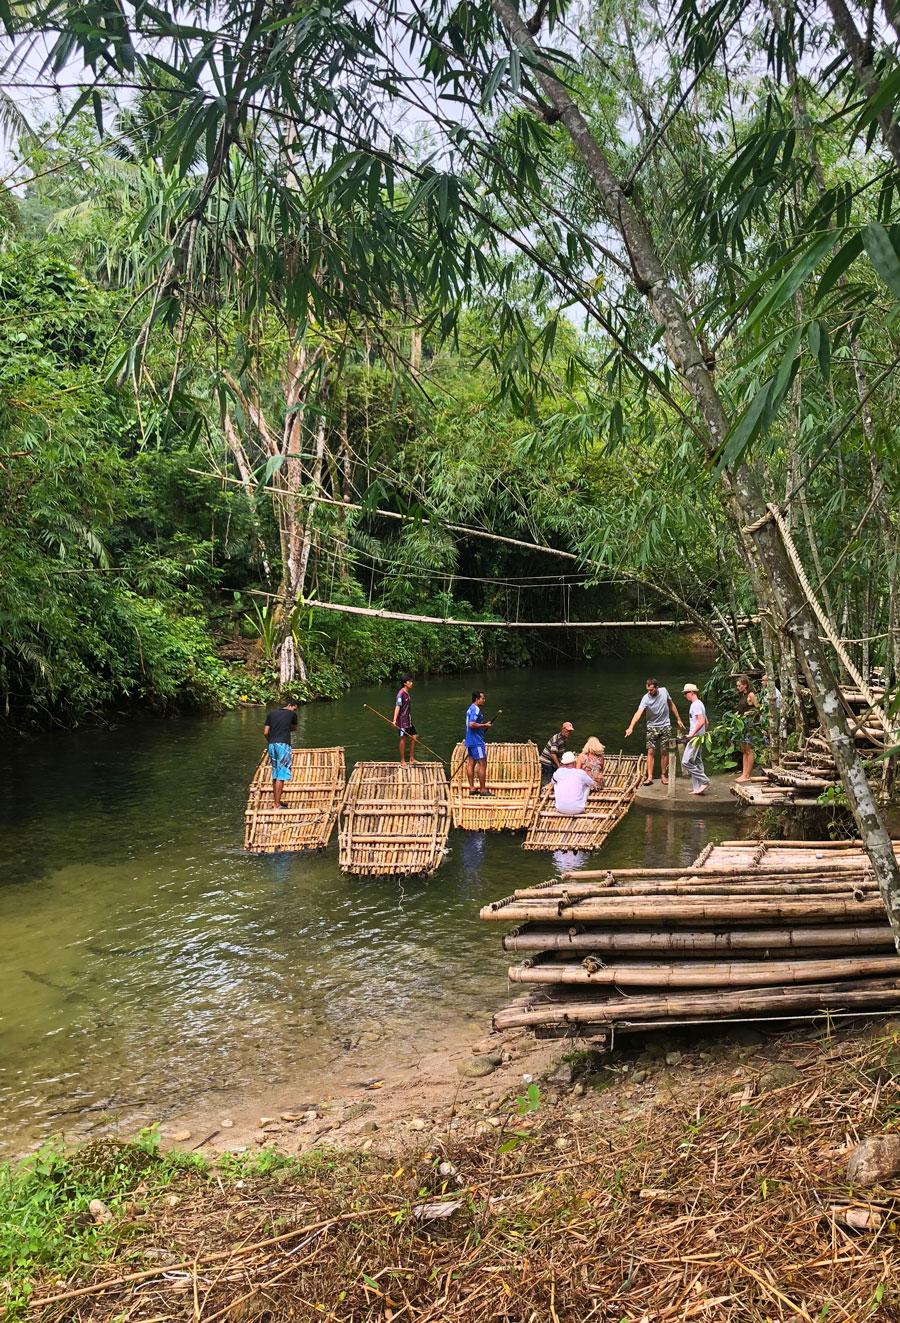 сплав на бамбуковых плотах